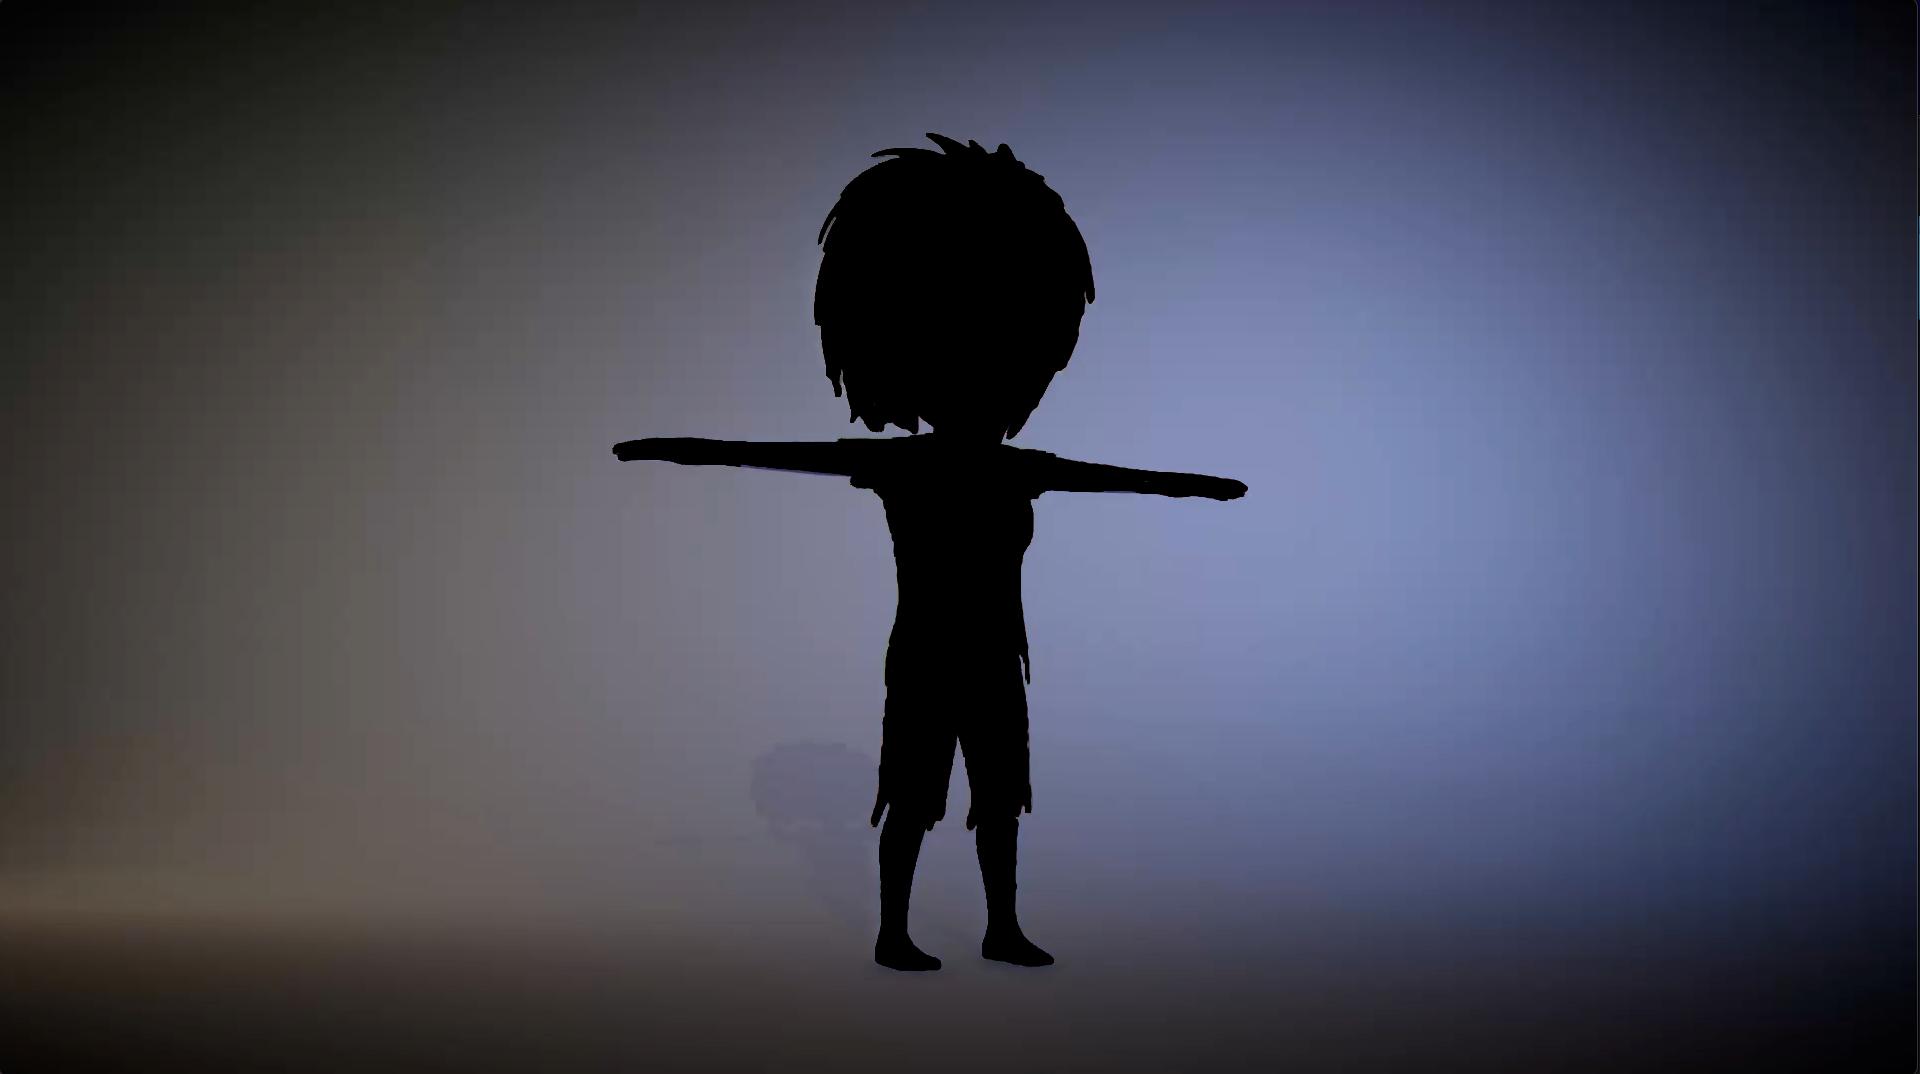 A Silhouette of Pri' the zombie